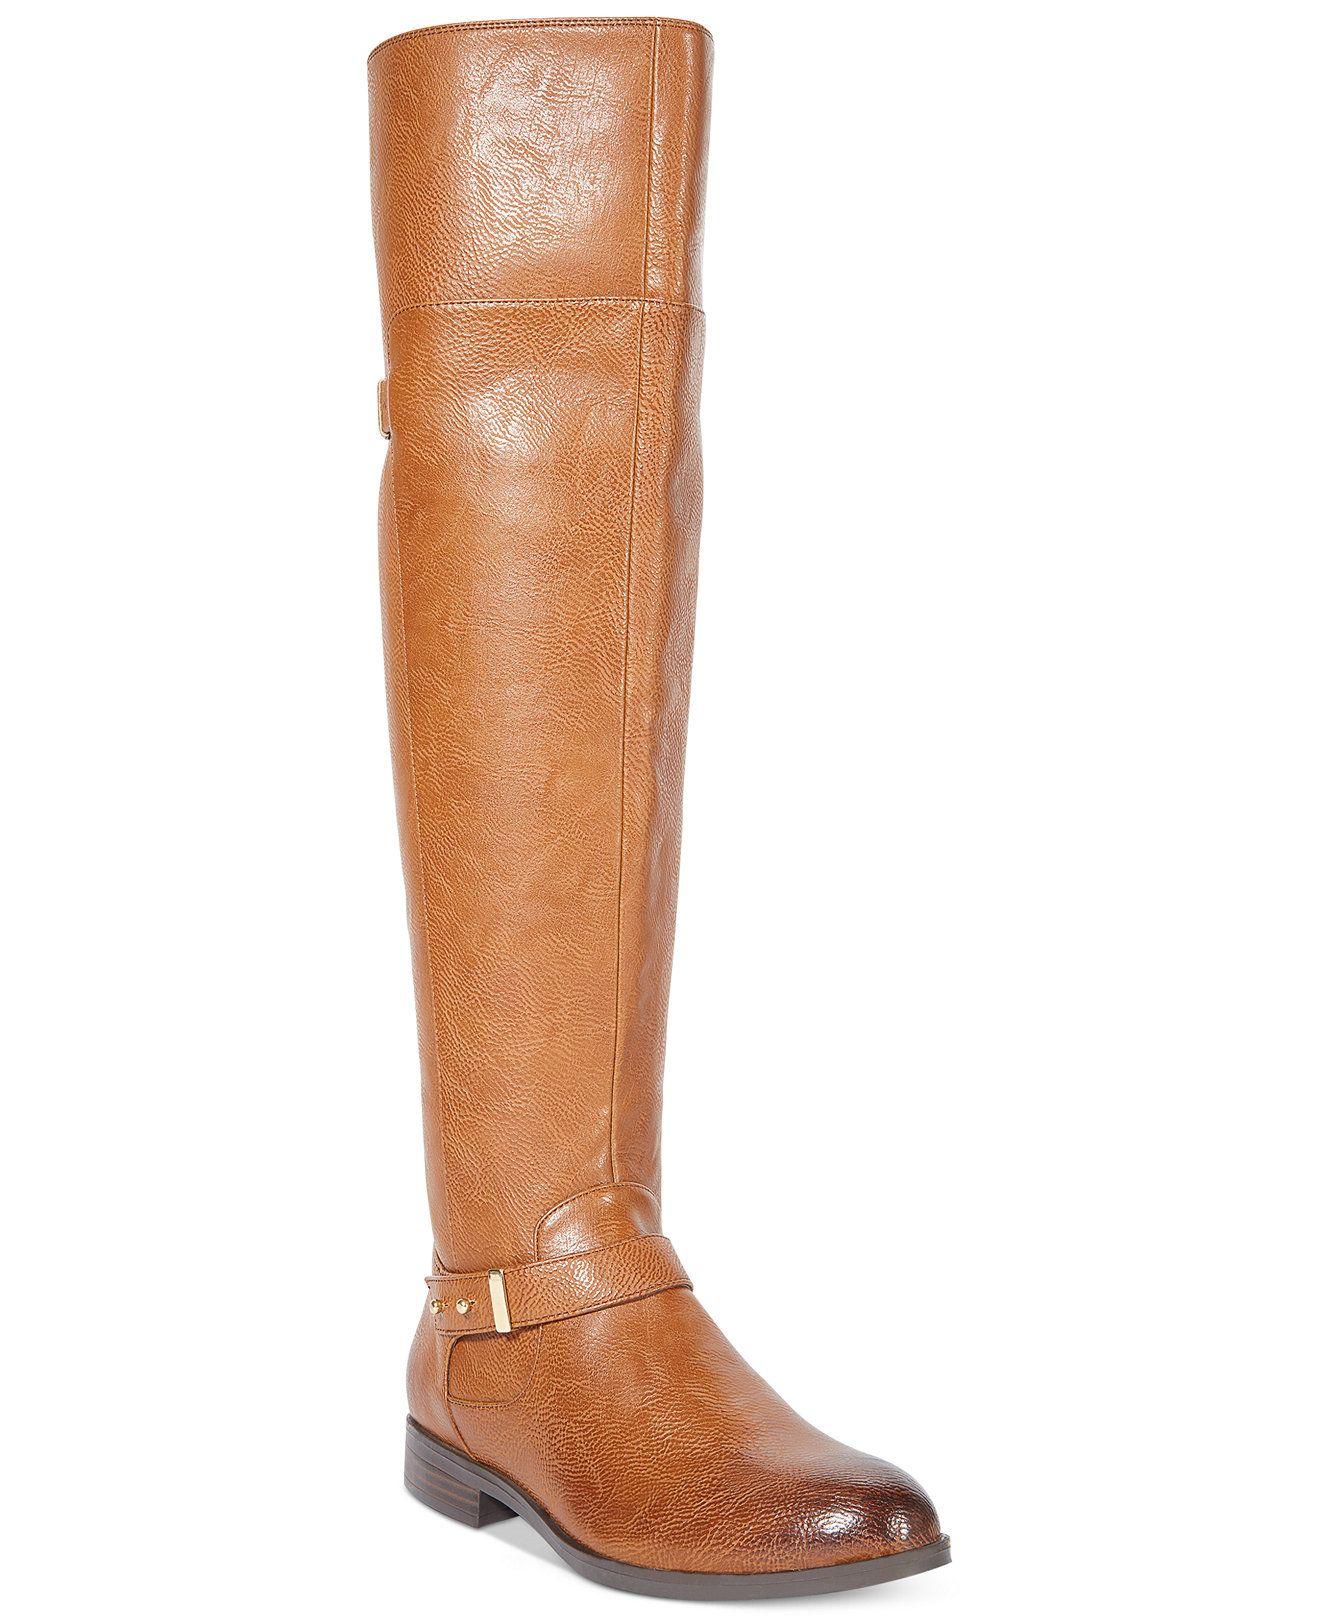 21a92c7b761d Bar III Deidre Over The Knee Wide Calf Boots - Boots - Shoes - Macy s